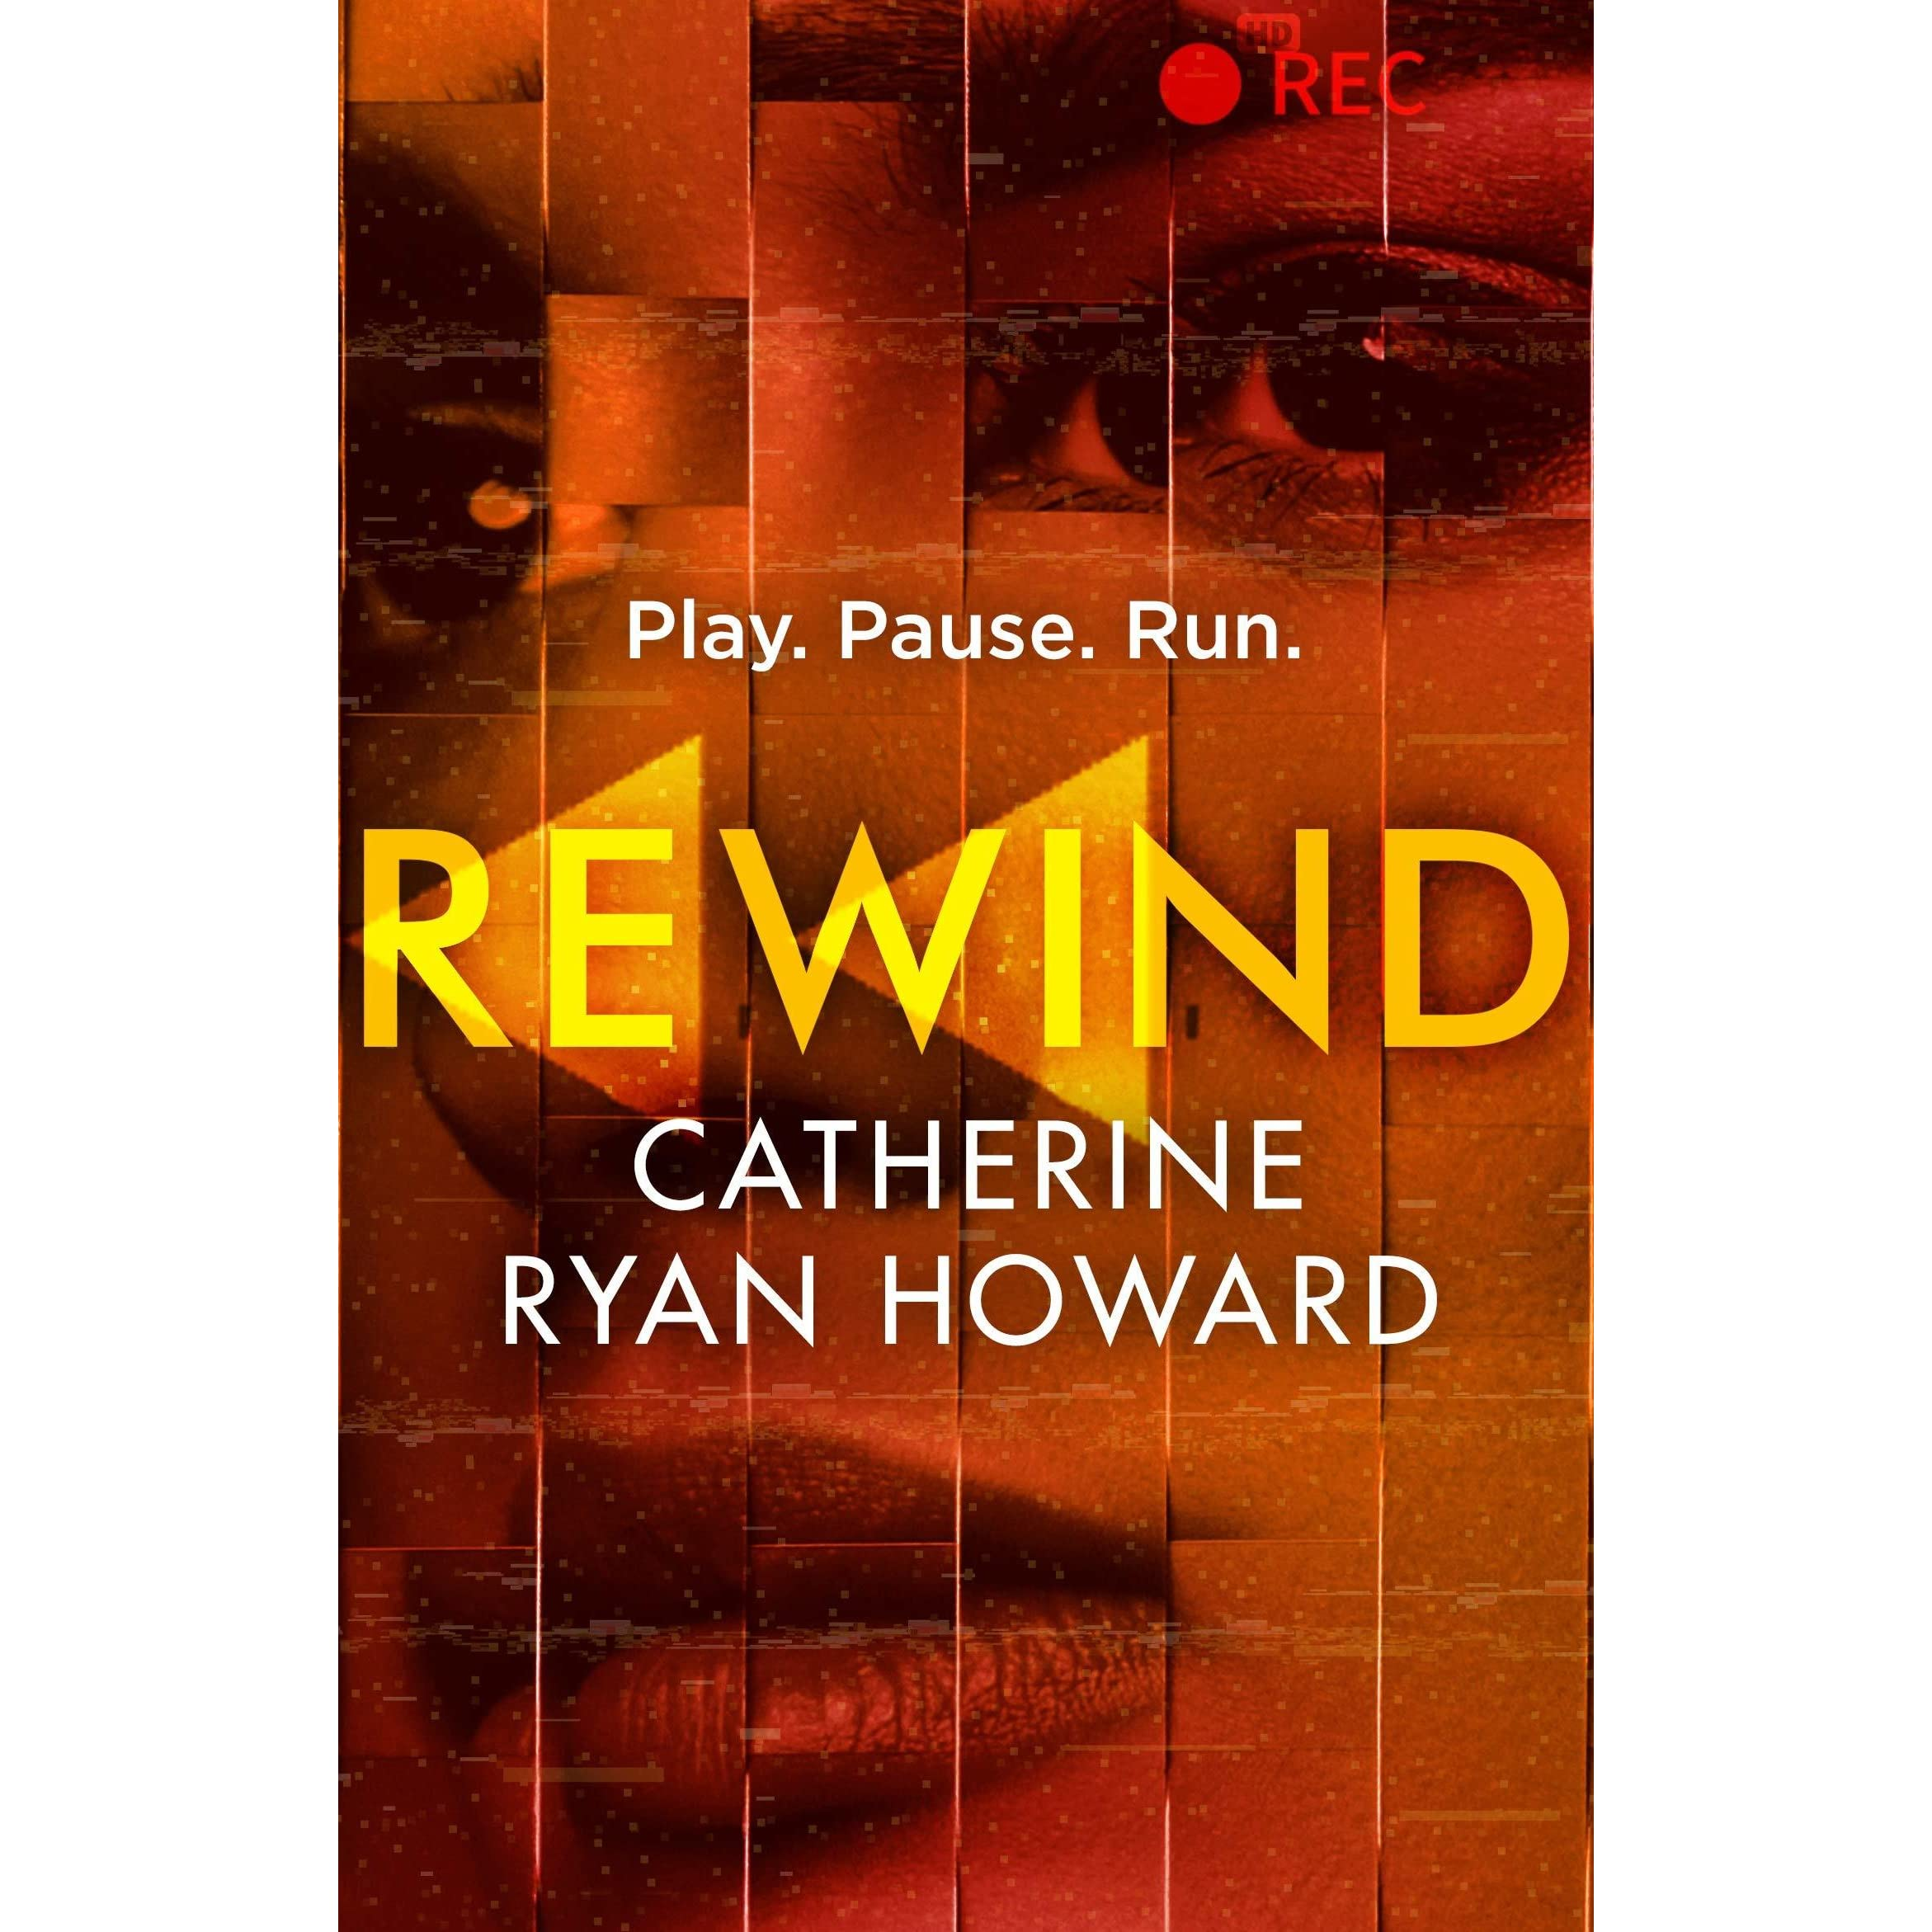 Rewind by Catherine Ryan Howard